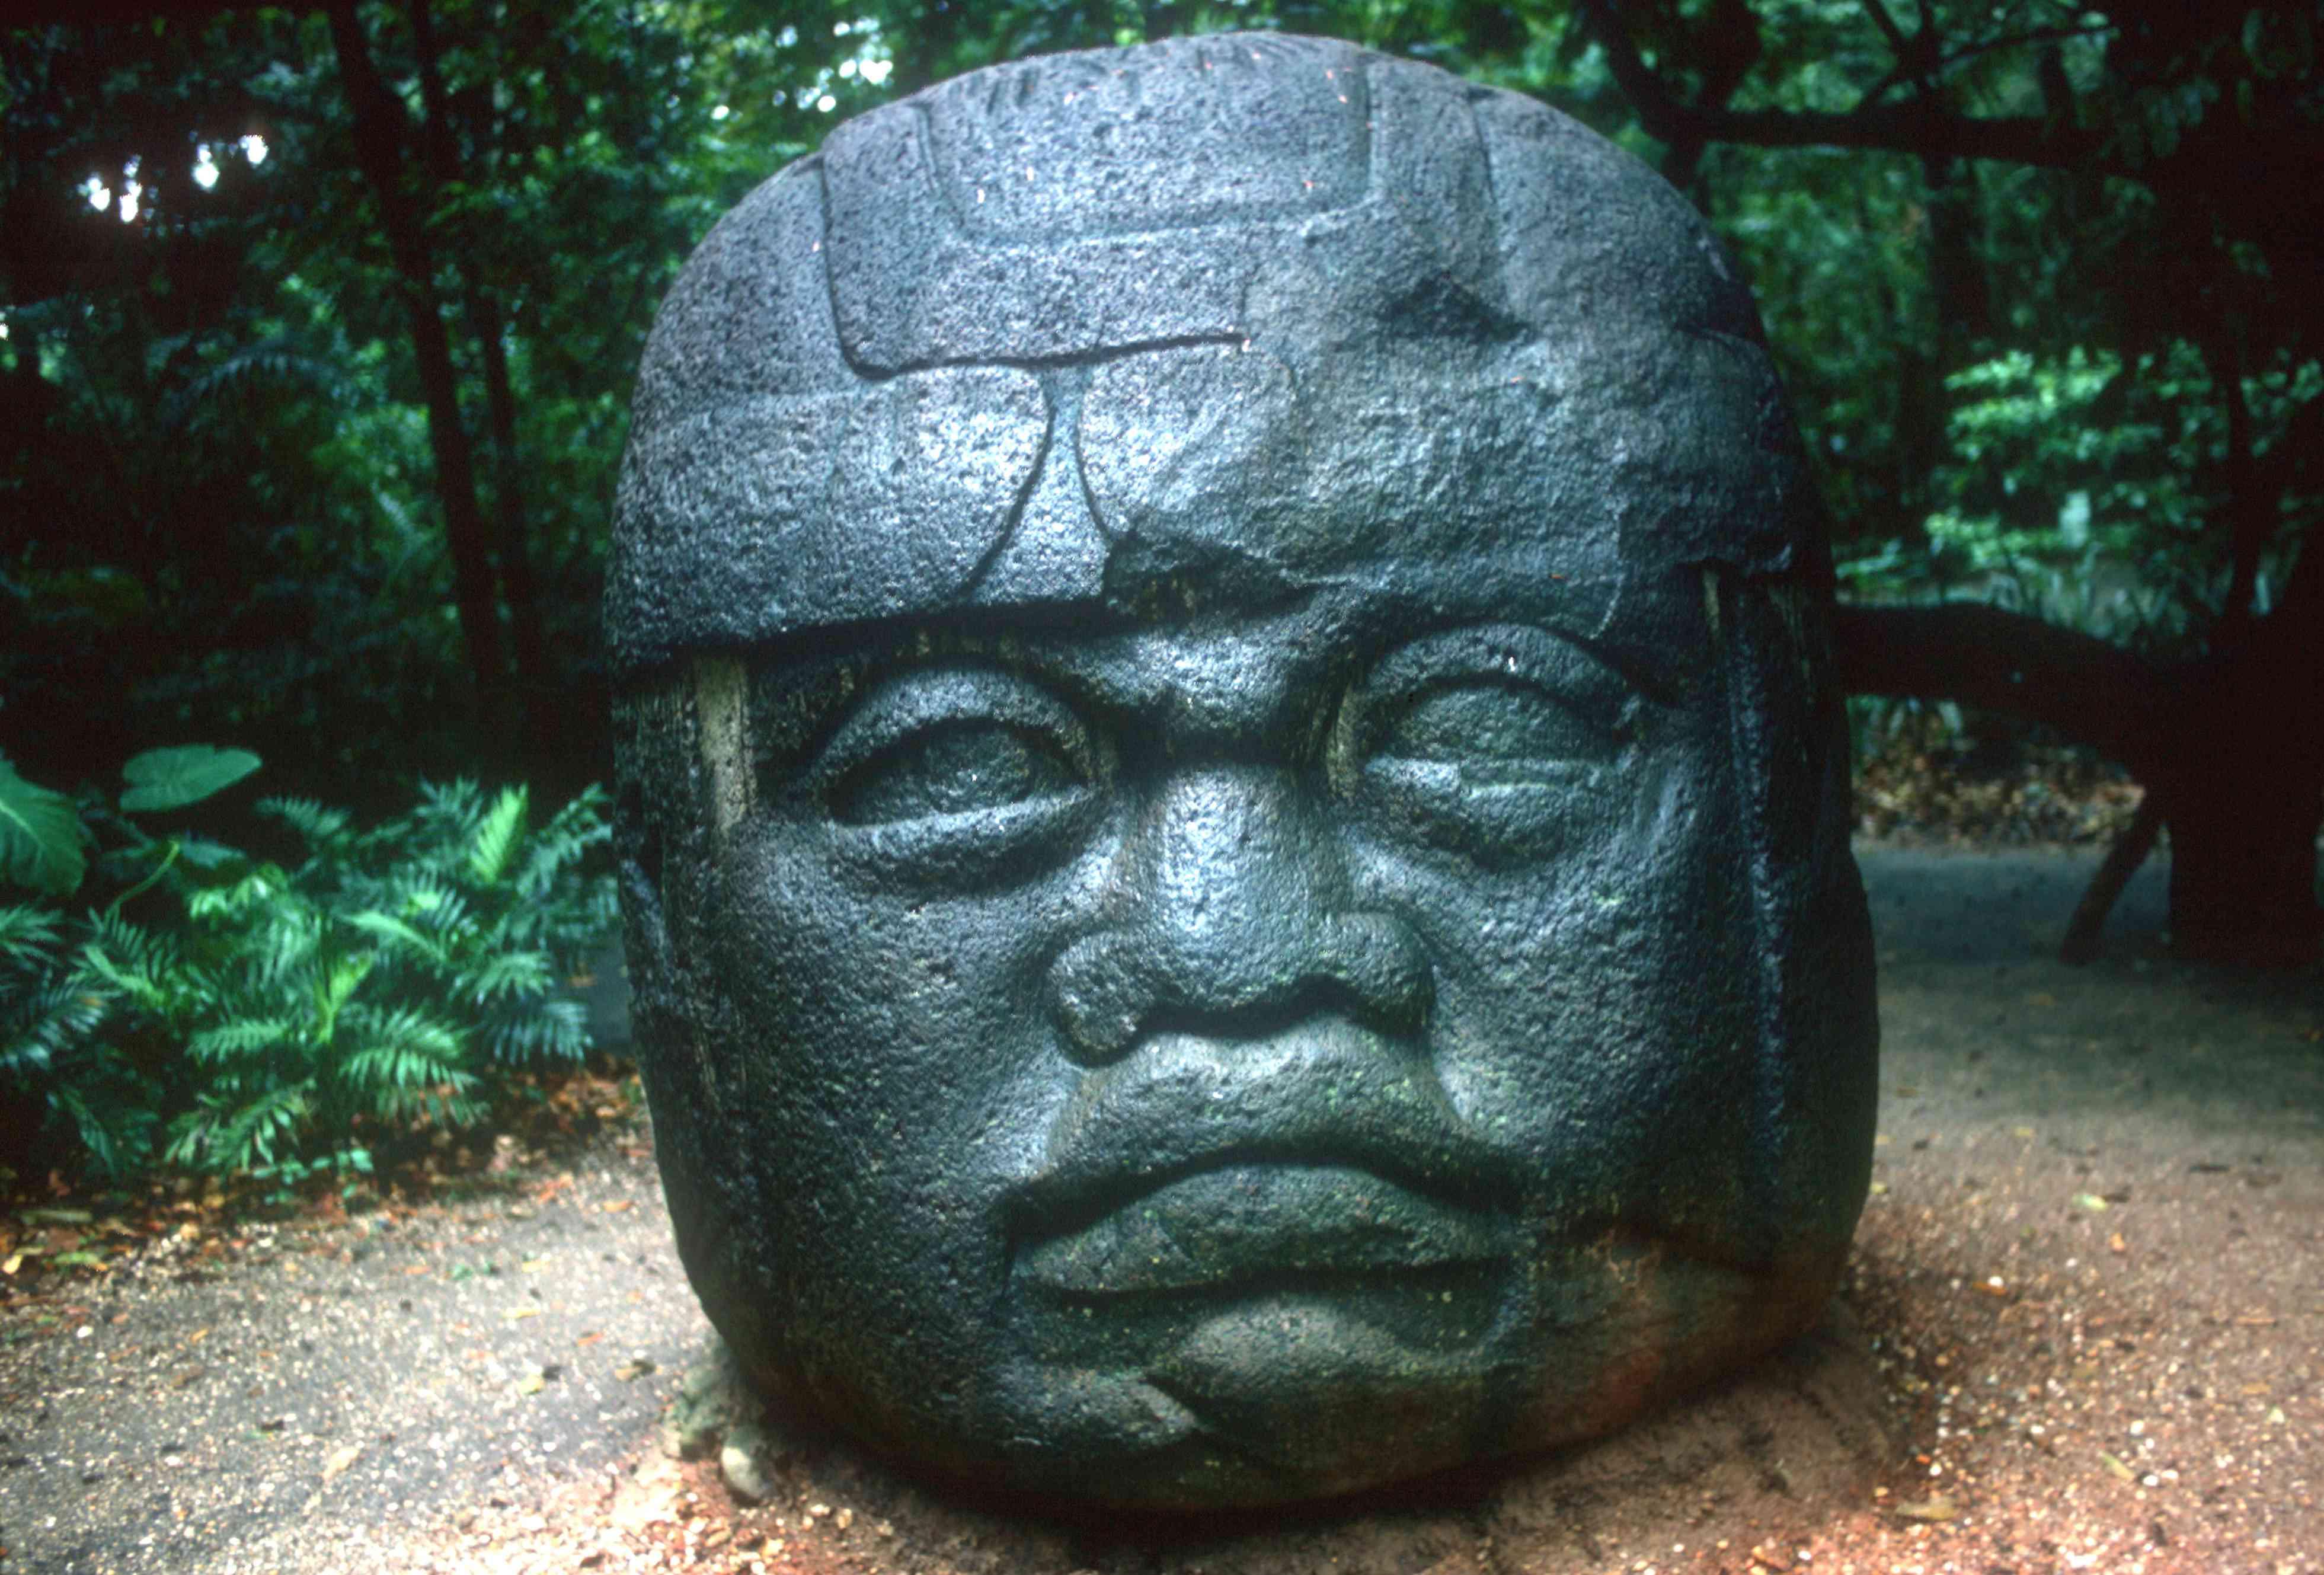 Olmec carved head from La Venta, Pre-Columbian, Central America